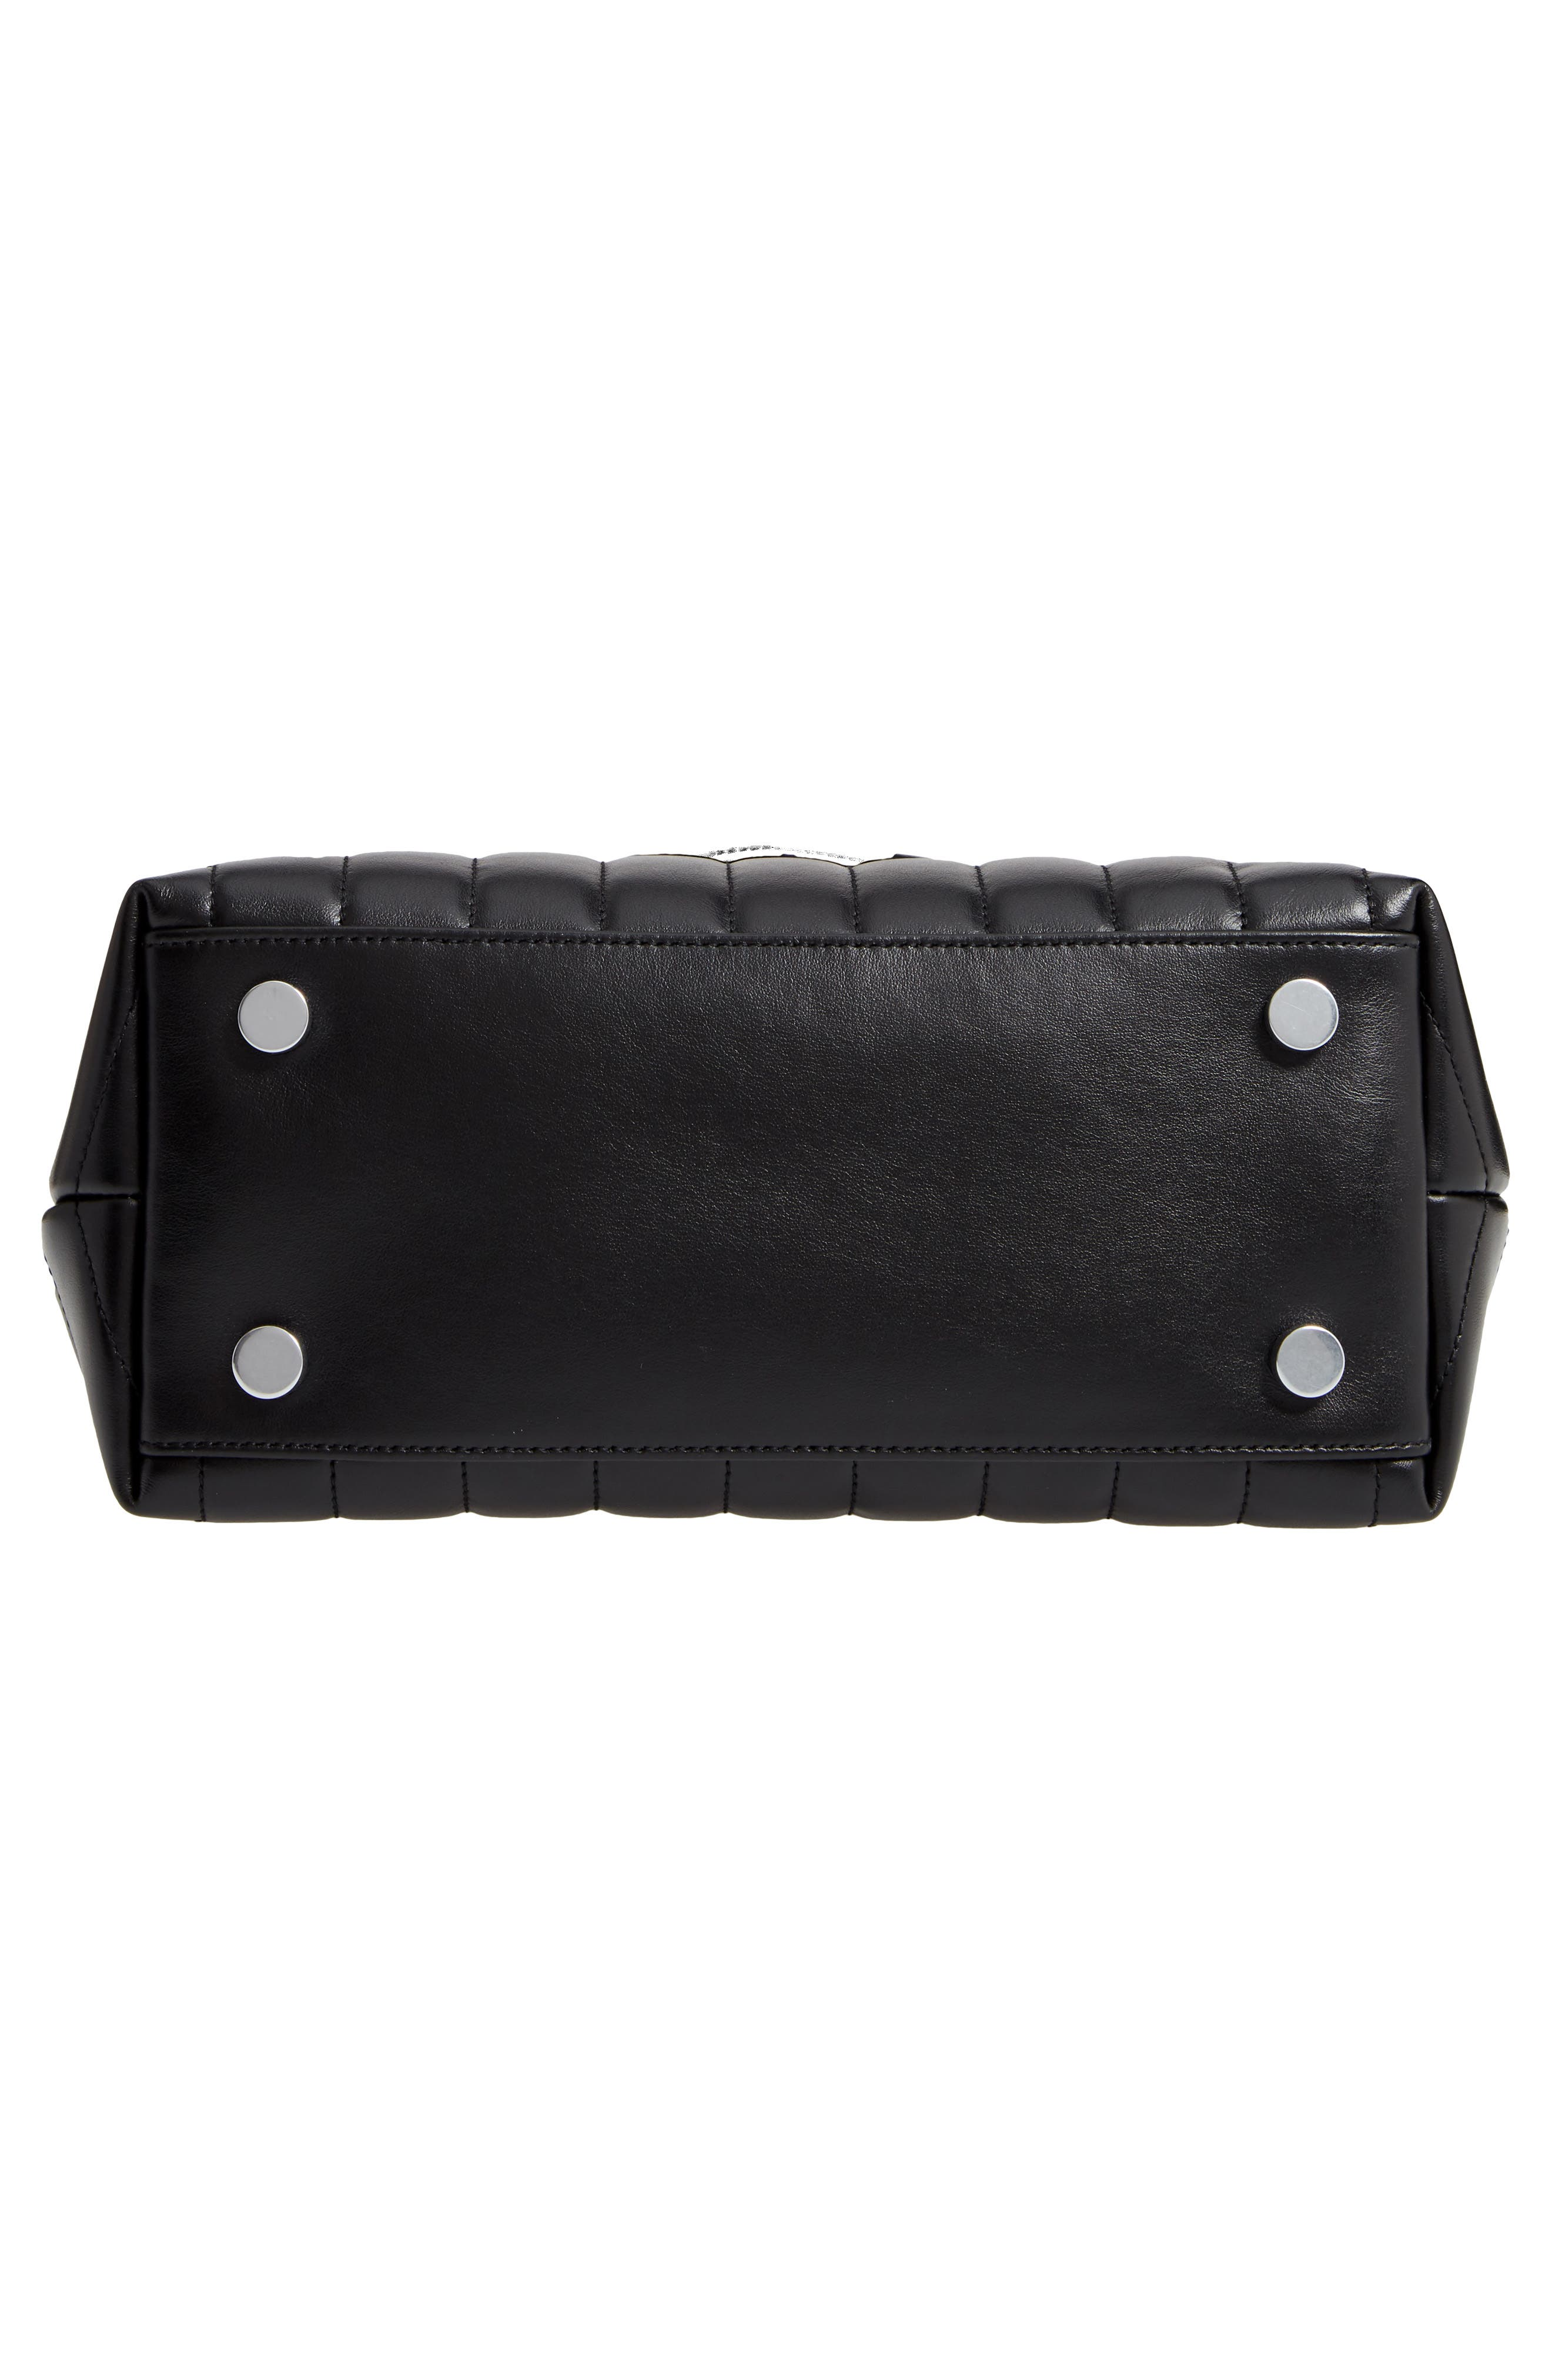 Loulou Leather Top Handle Satchel,                             Alternate thumbnail 6, color,                             NERO/ NERO